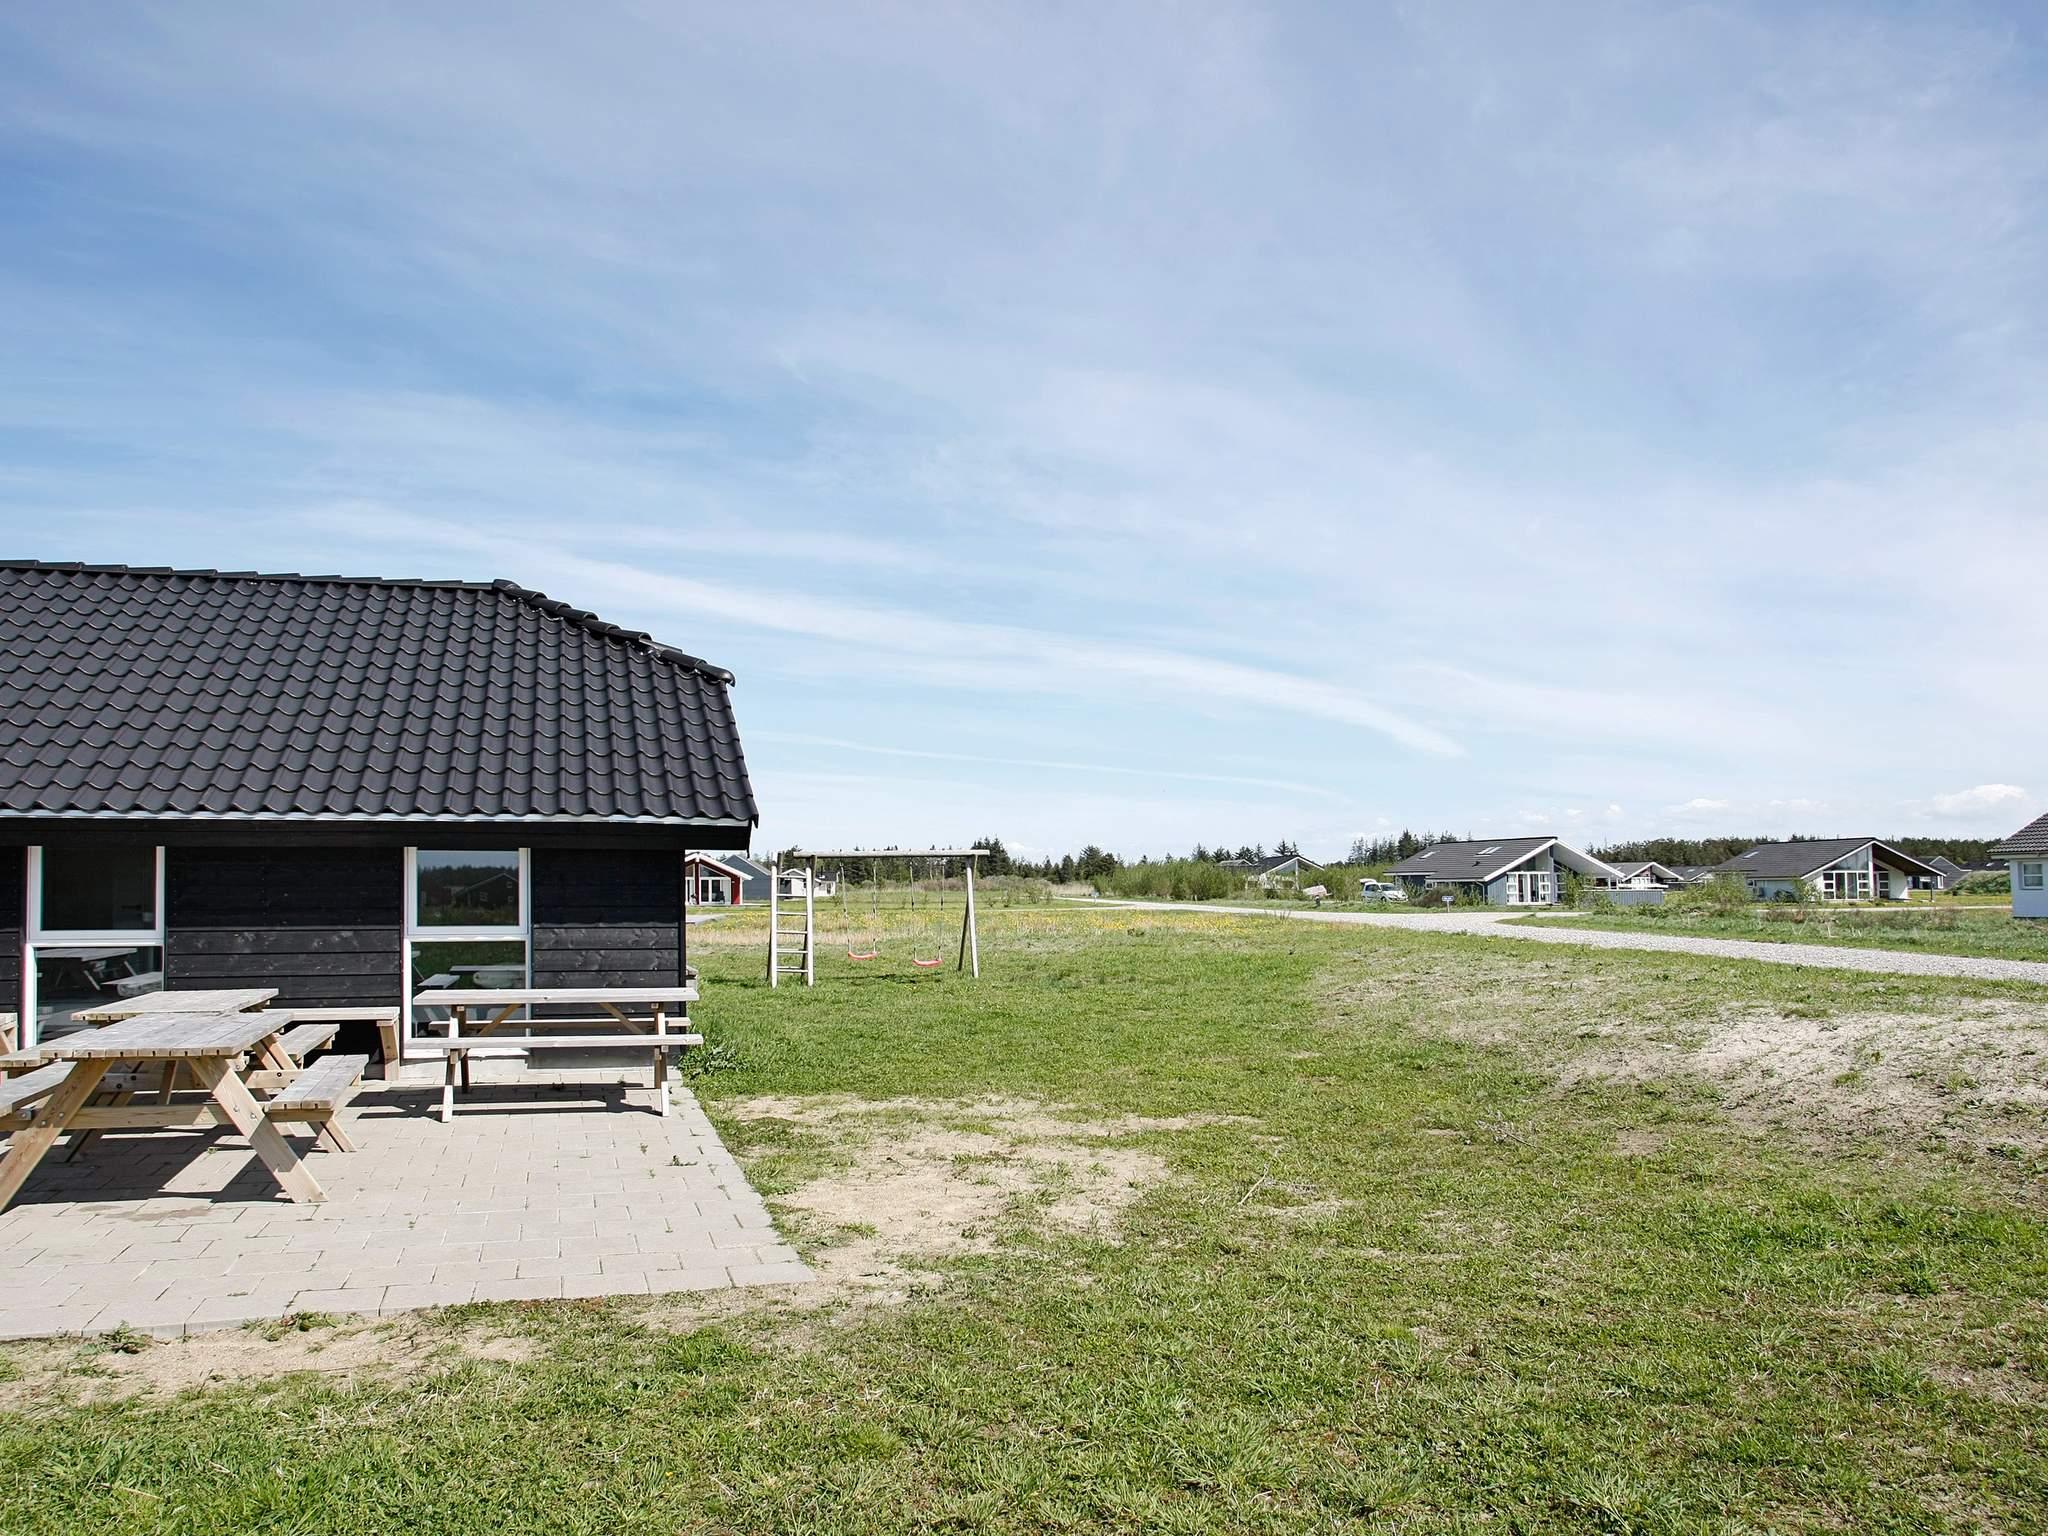 Ferienhaus Tranum Strand (424921), Tranum Enge, , Nordwestjütland, Dänemark, Bild 24